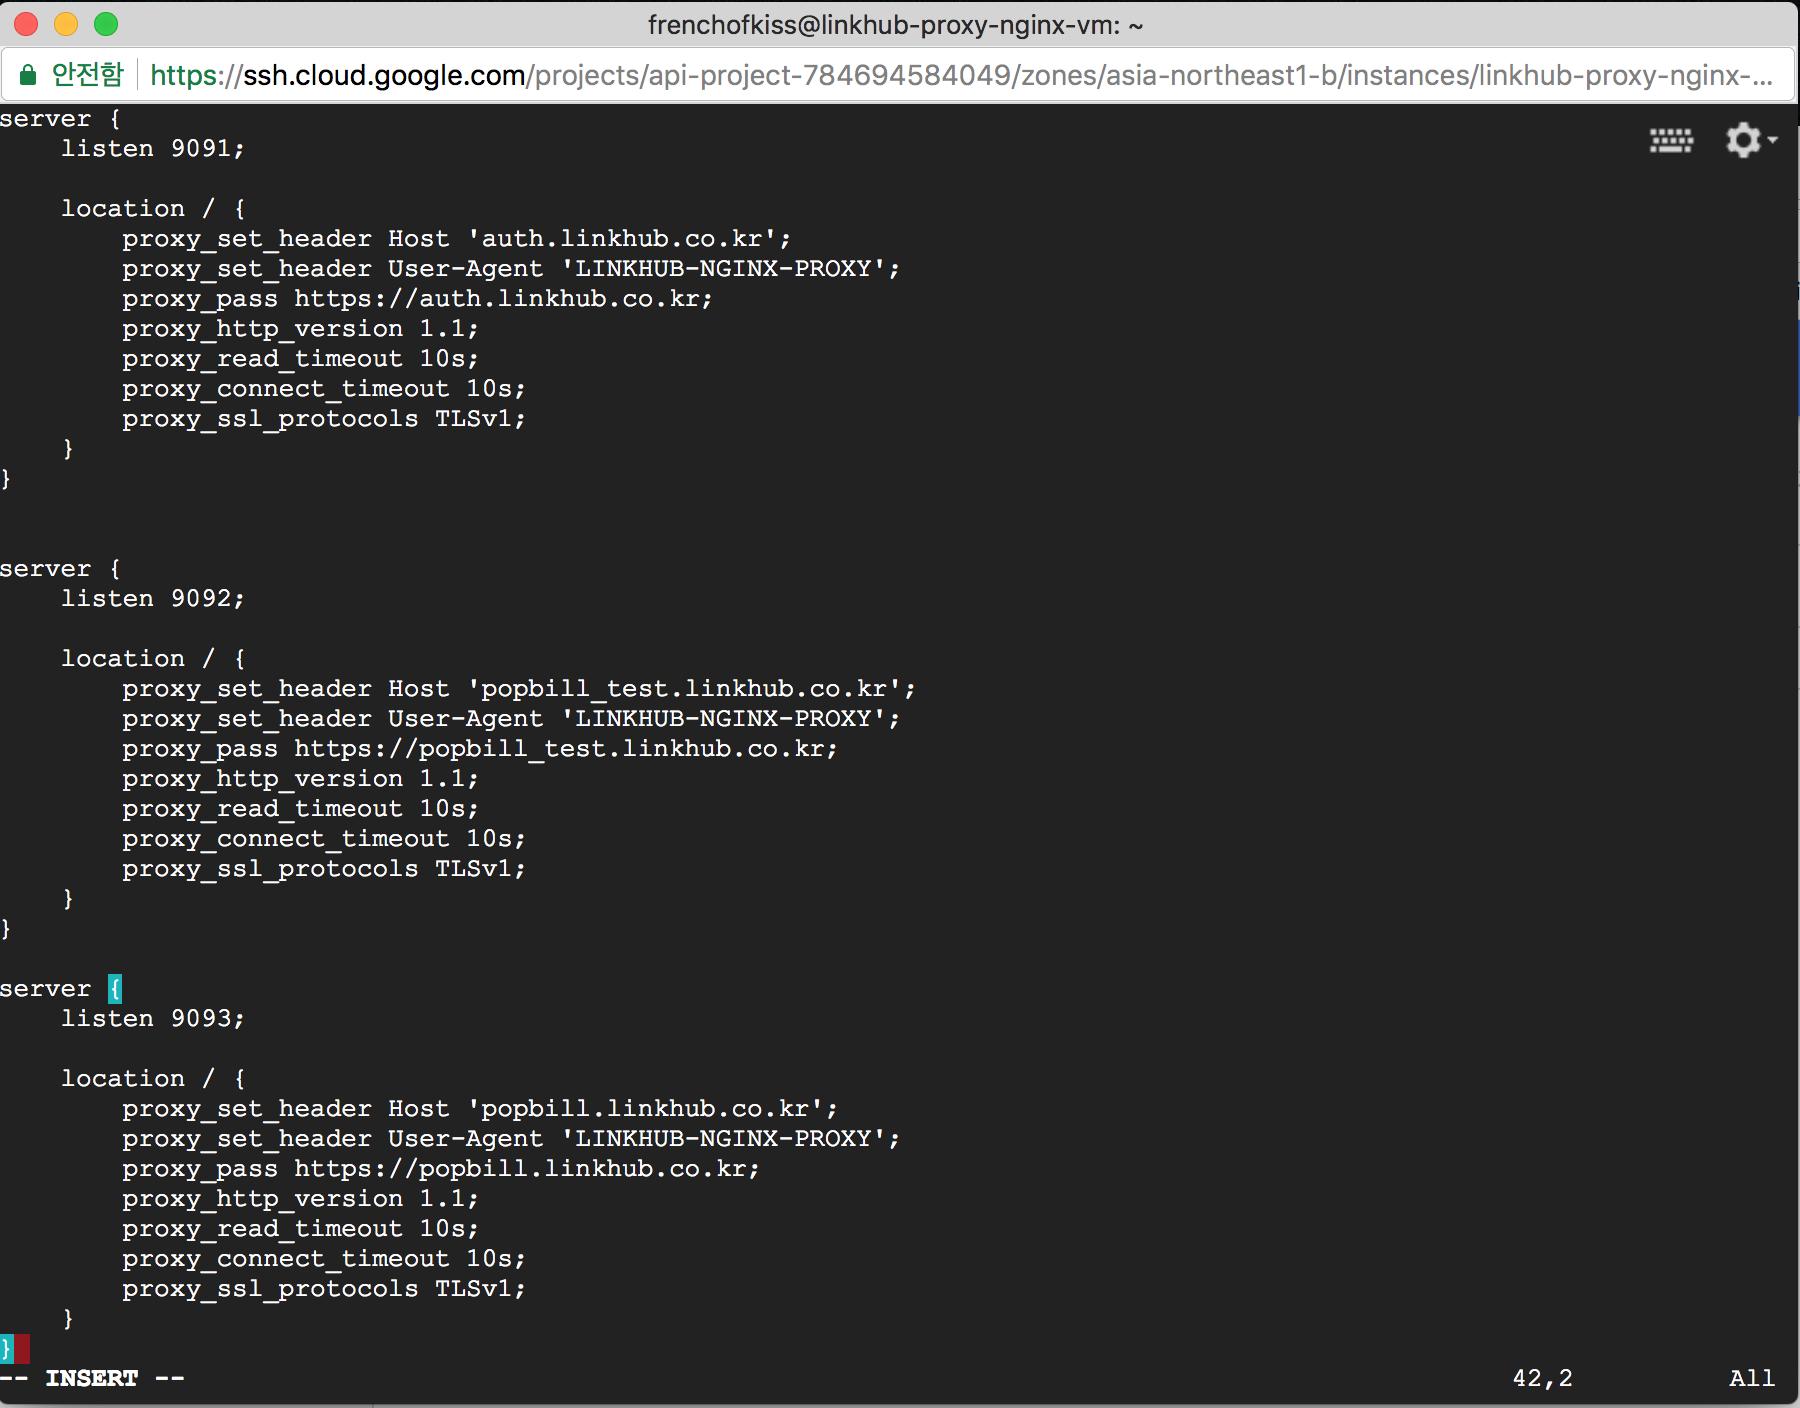 nginx proxy configuration